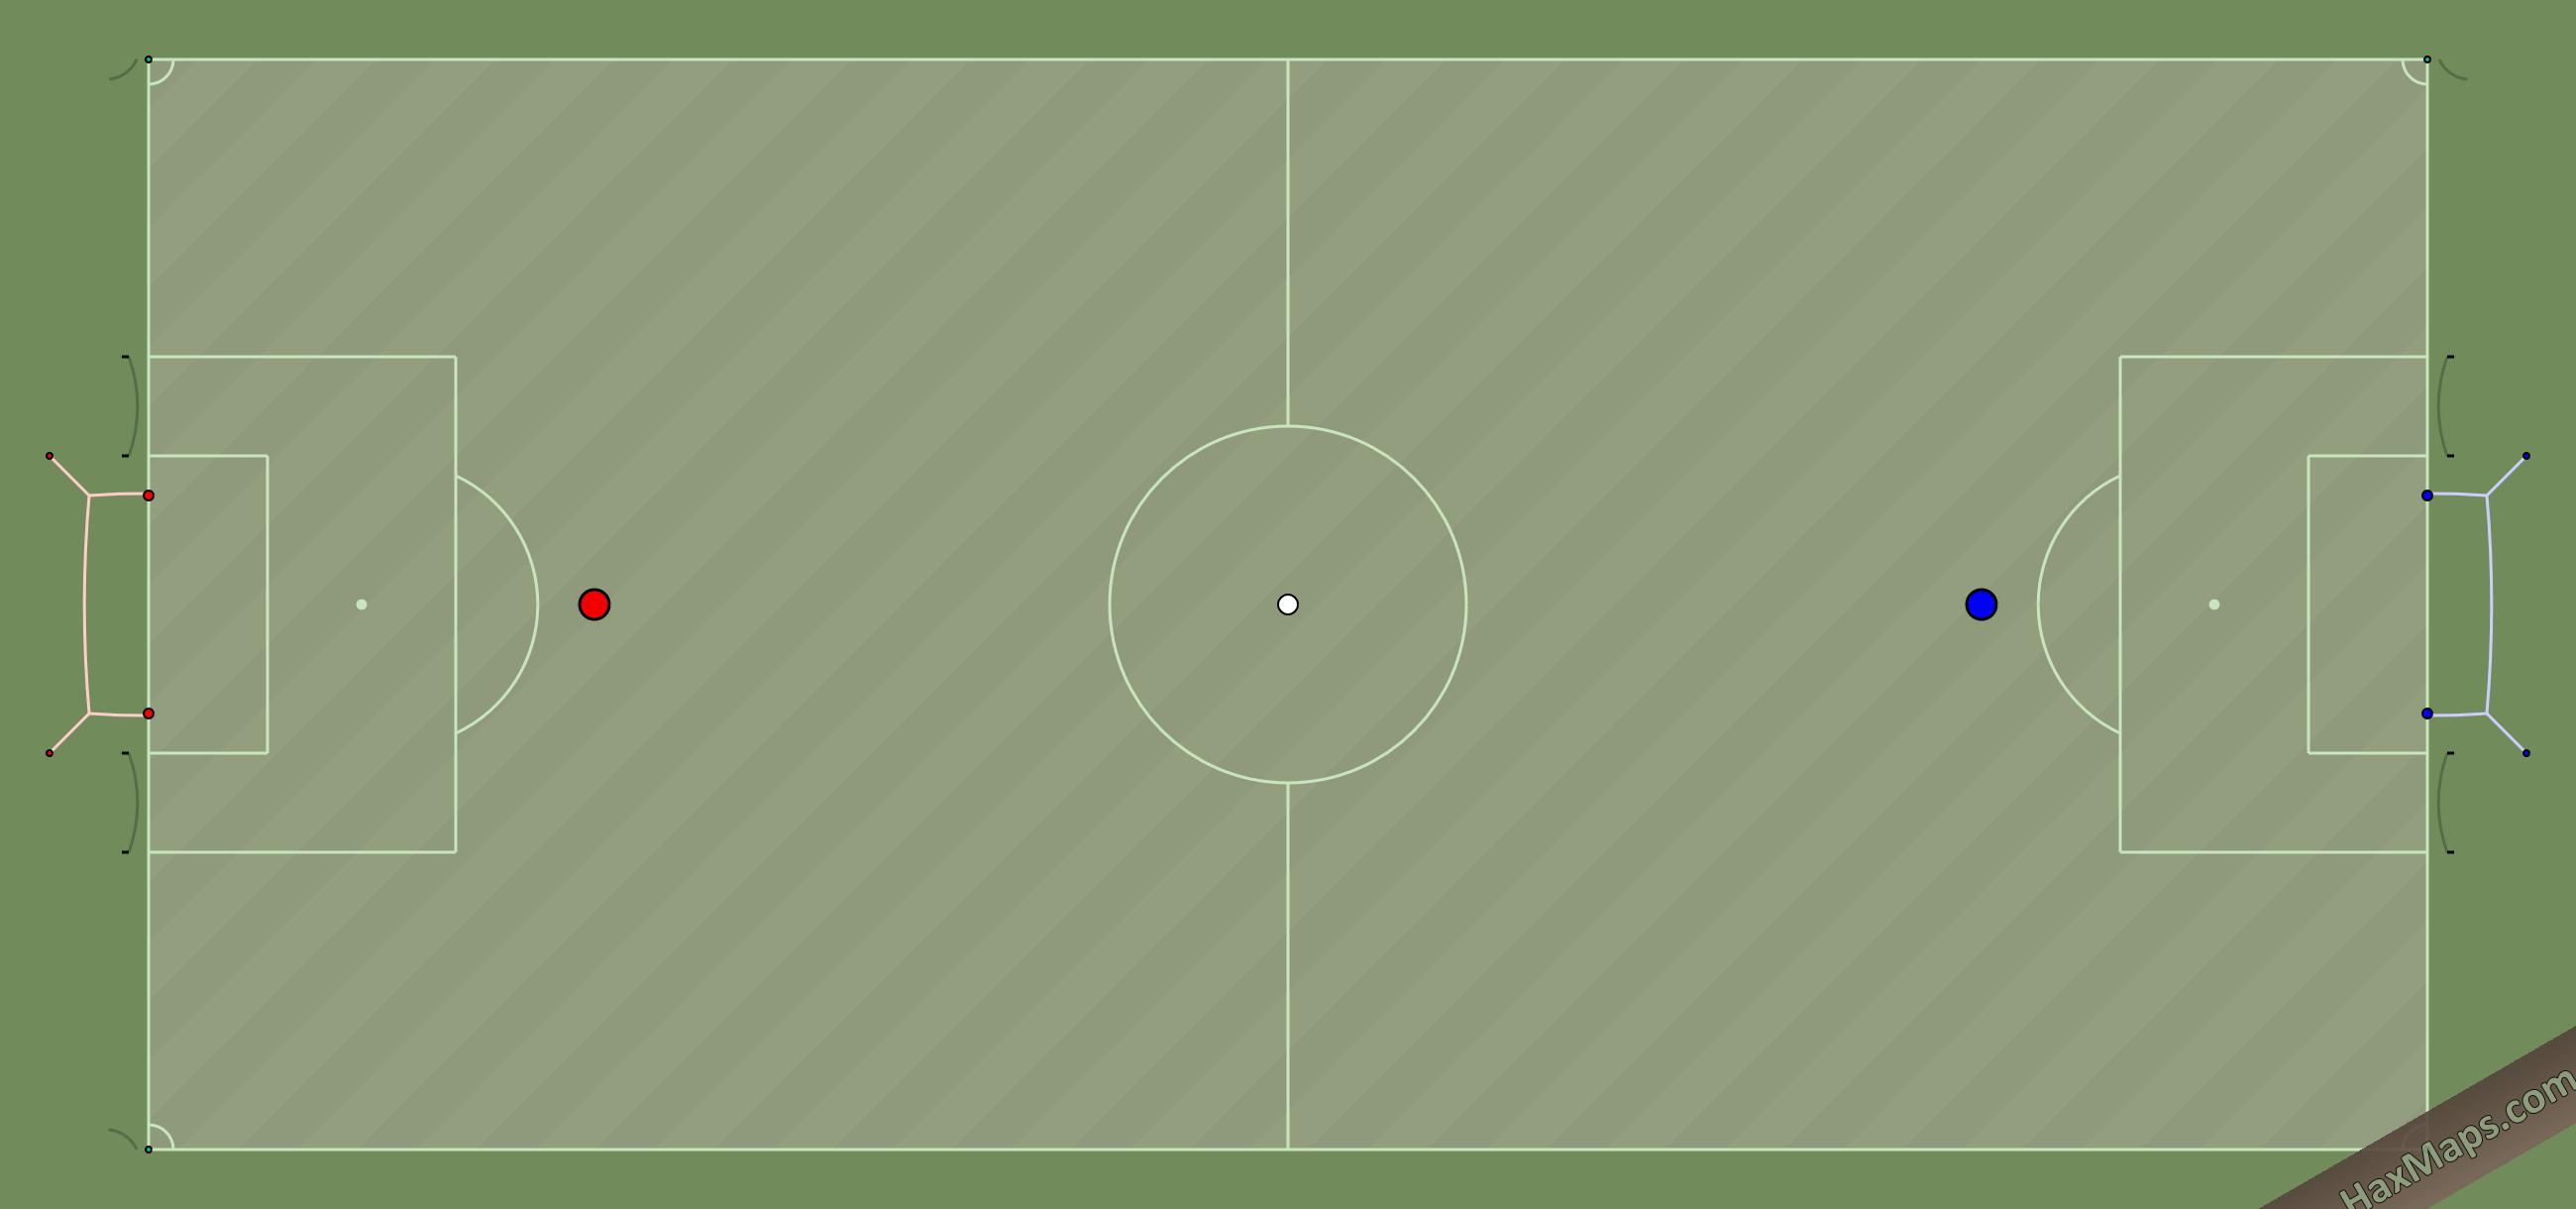 hax ball maps | Real Soccer v4 byTatiCT